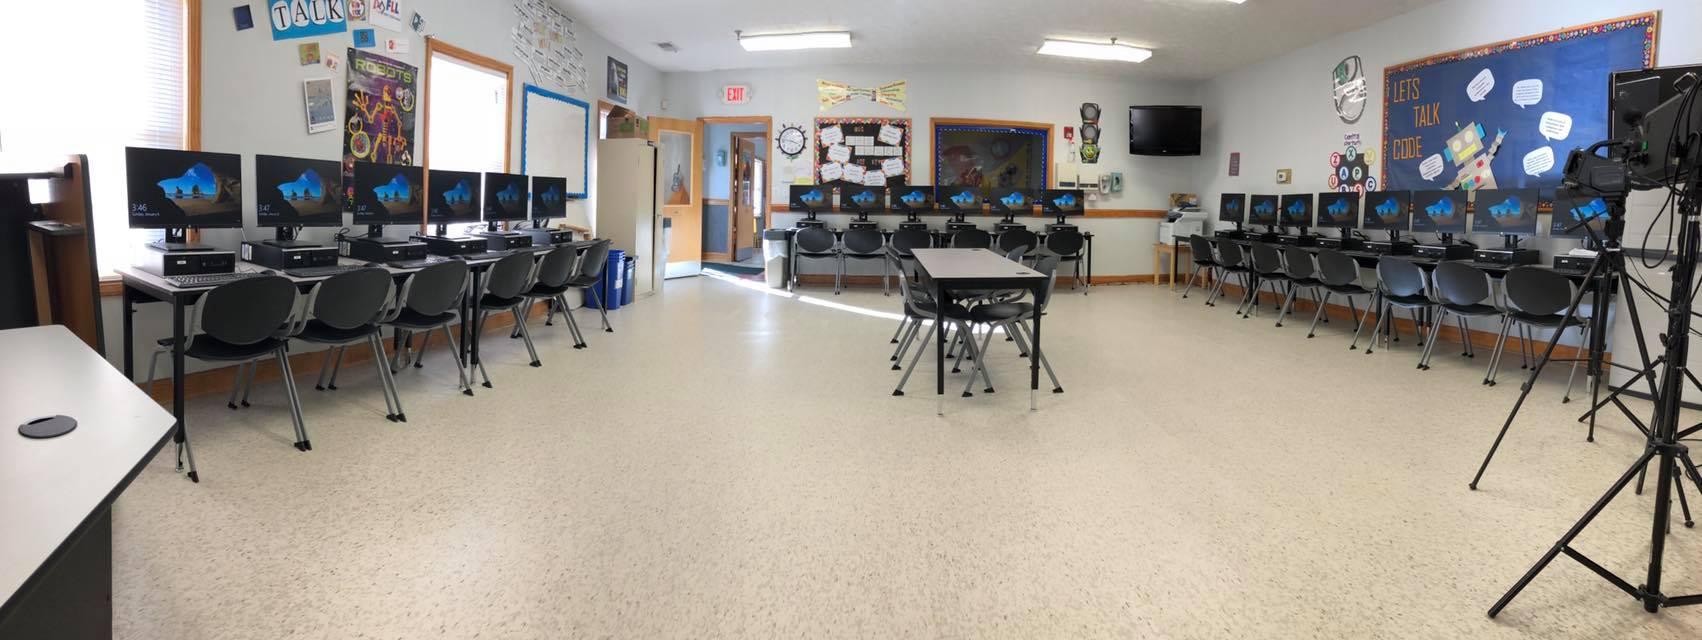 new computer lab alpharetta johns creek private school